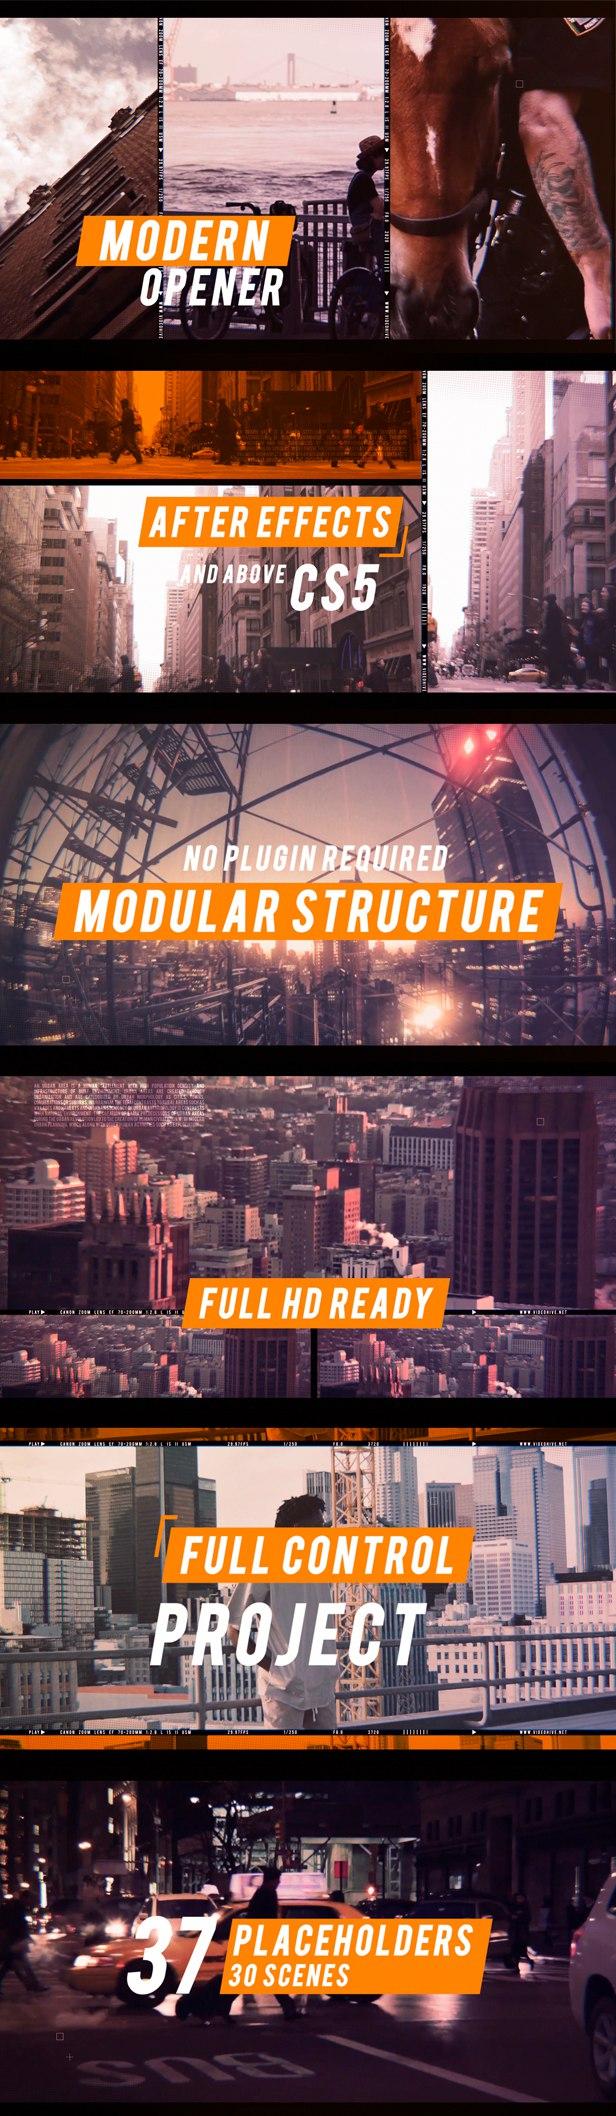 Urban Rhythm | Modern Opener 20836933 - Free After Effects Template